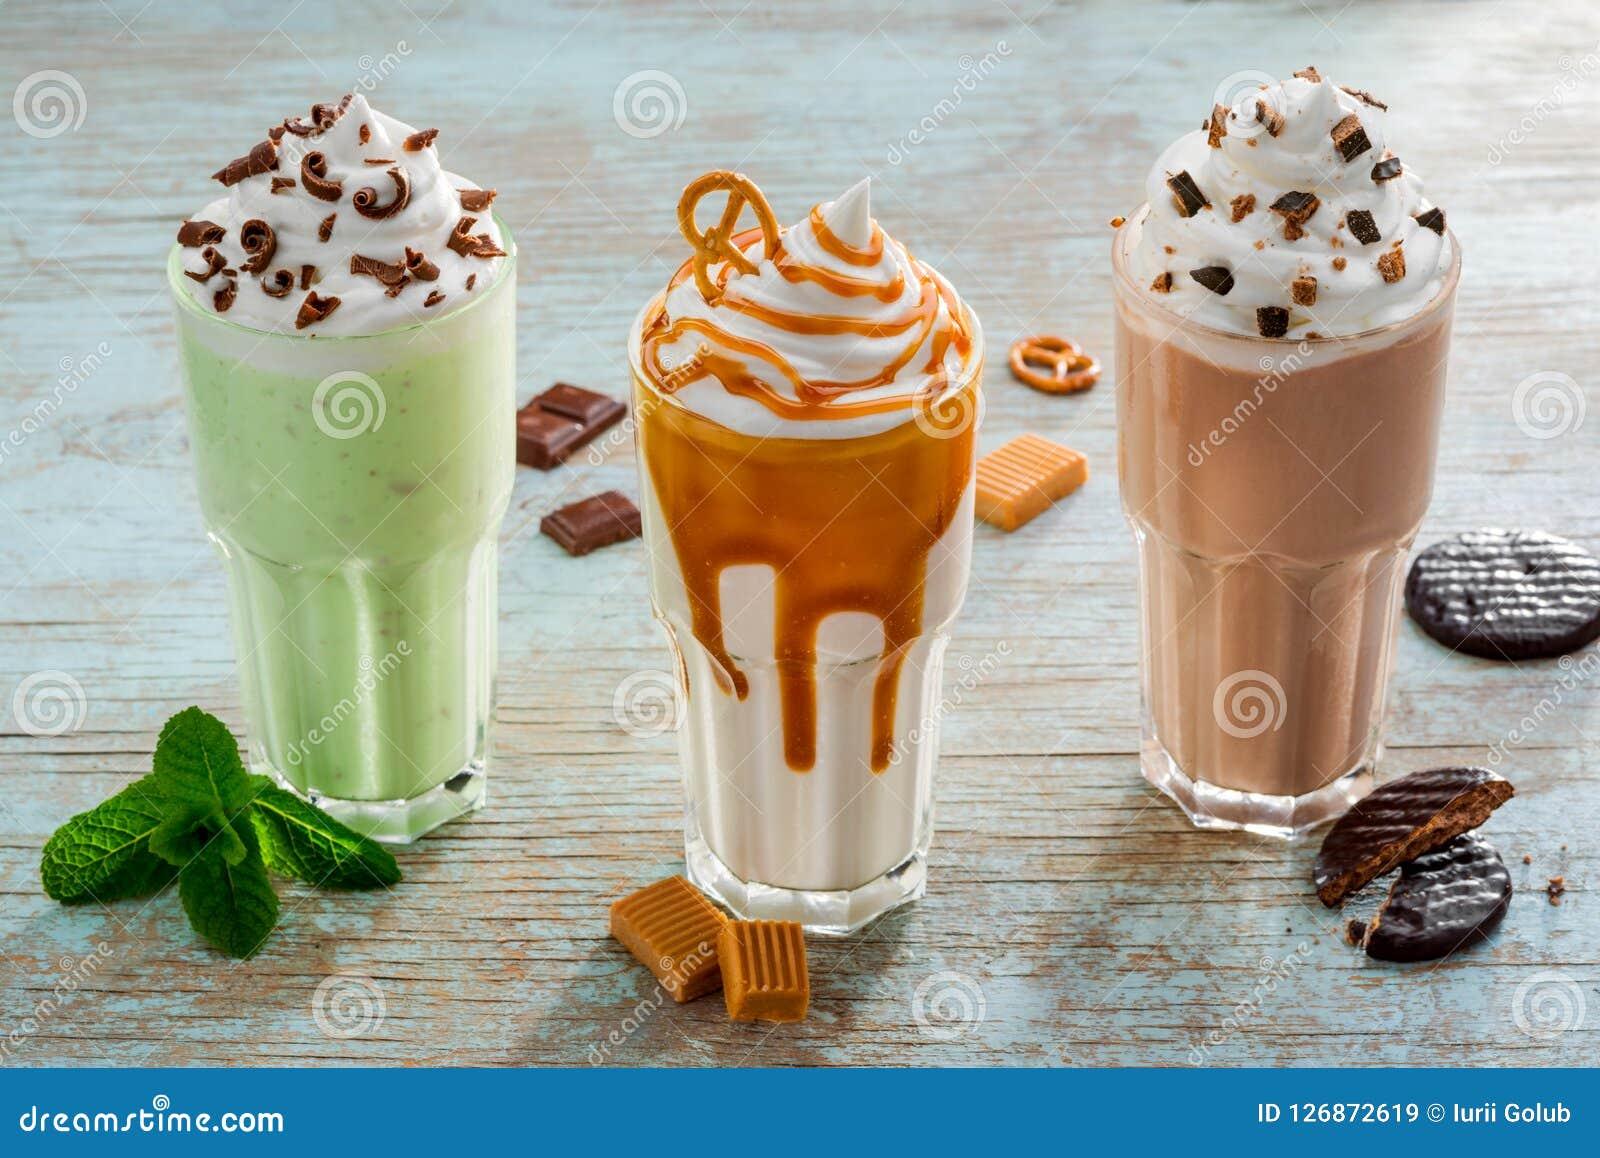 Milkshakes ως συμπαθητικές παραλλαγές για το θερινό χρόνο